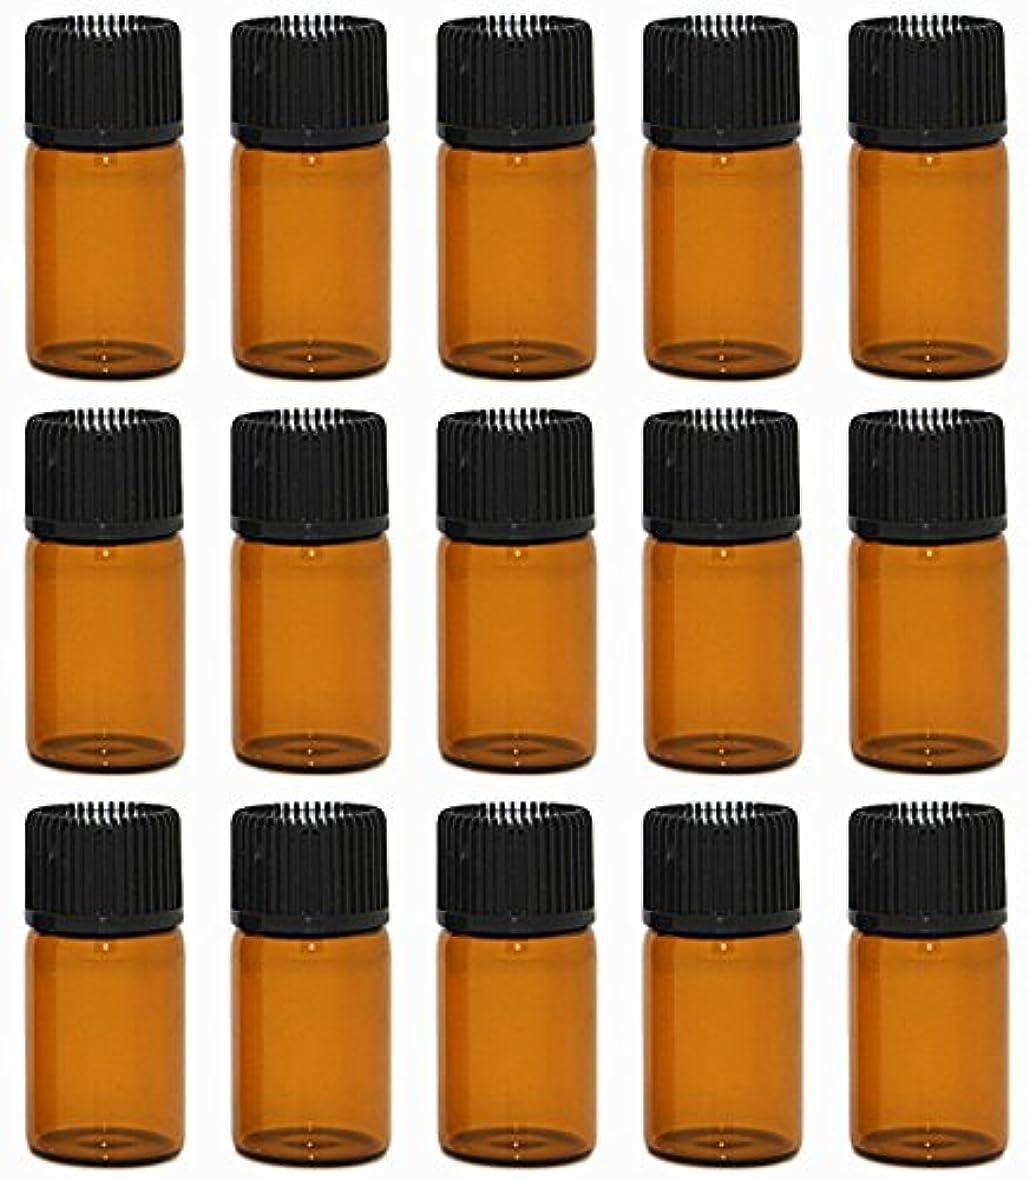 【Rurumi】アロマオイル 精油 小分け用 遮光瓶 セット 茶 ガラス アロマ ボトル オイル 用 茶色 瓶 ビン エッセンシャルオイル 保存 詰替え 瓶 ビン (3ml 15本 セット)